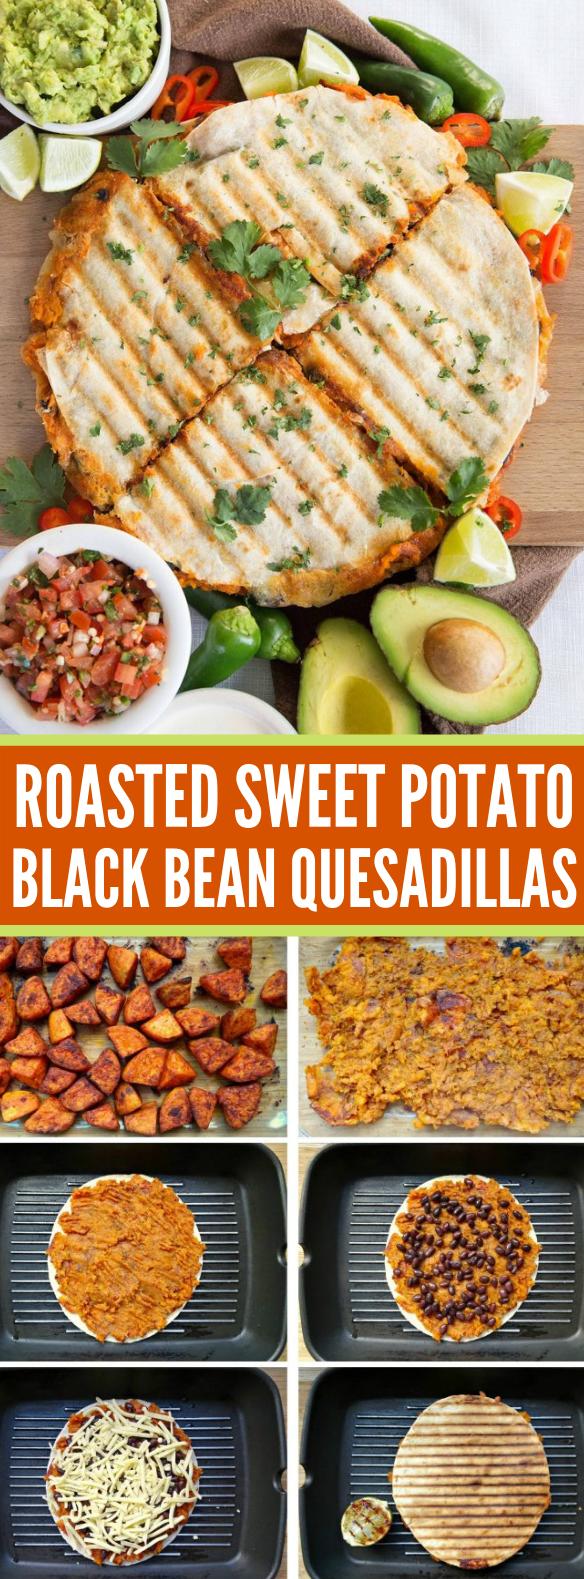 Roasted Sweet Potato and Black Bean Quesadillas #vegetarian #heartydinner